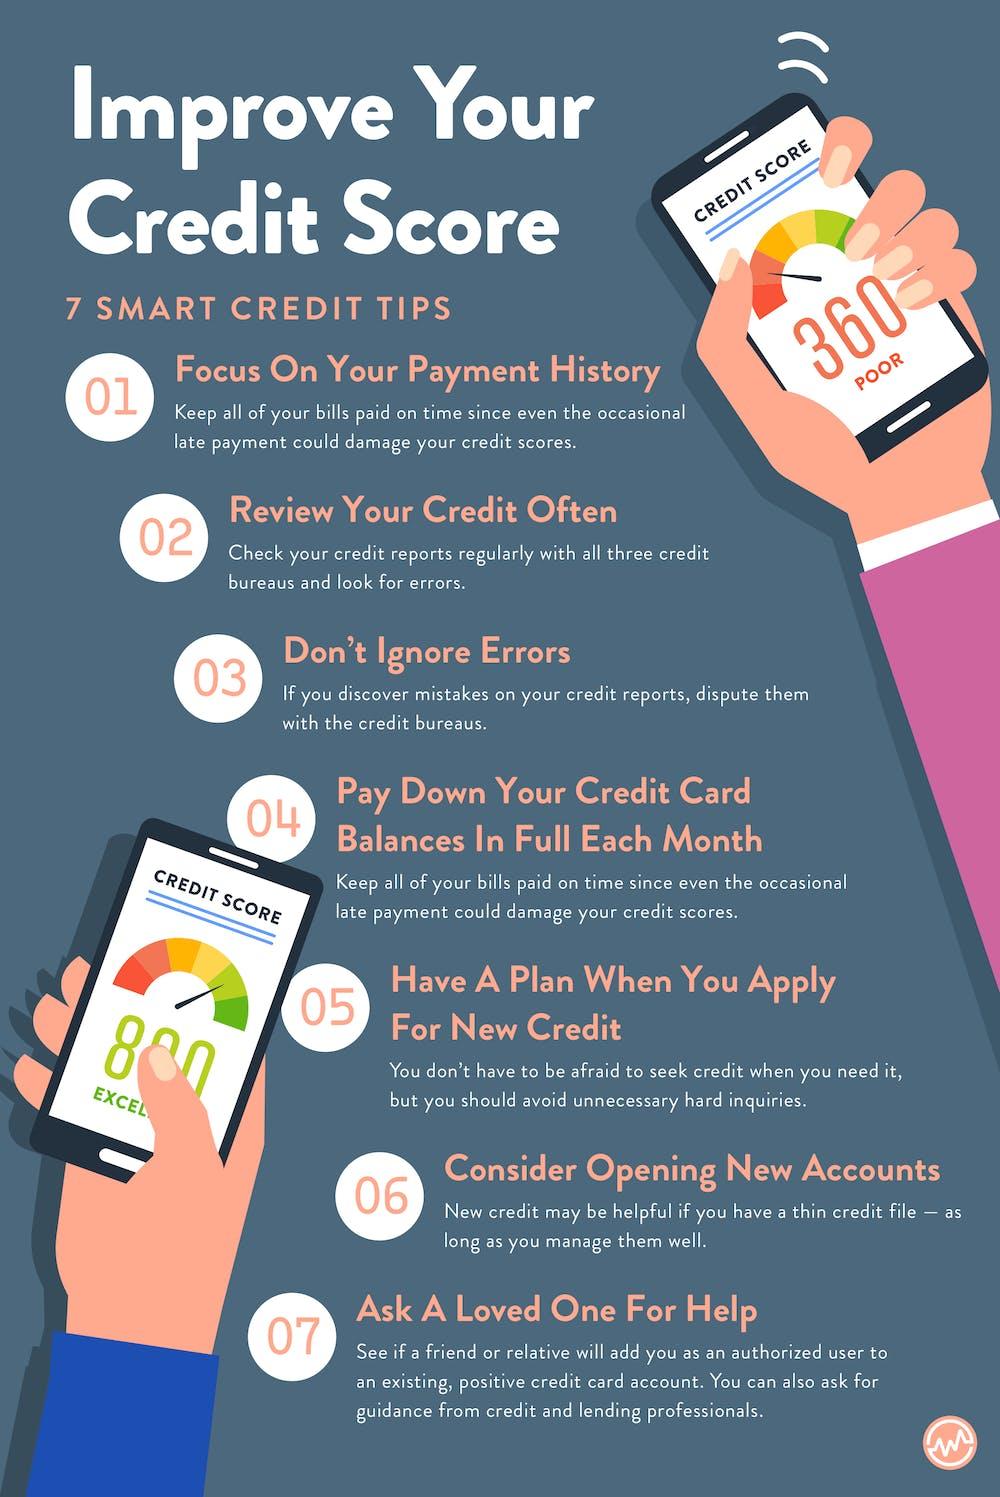 Improve your credit score instead of buying tradlines